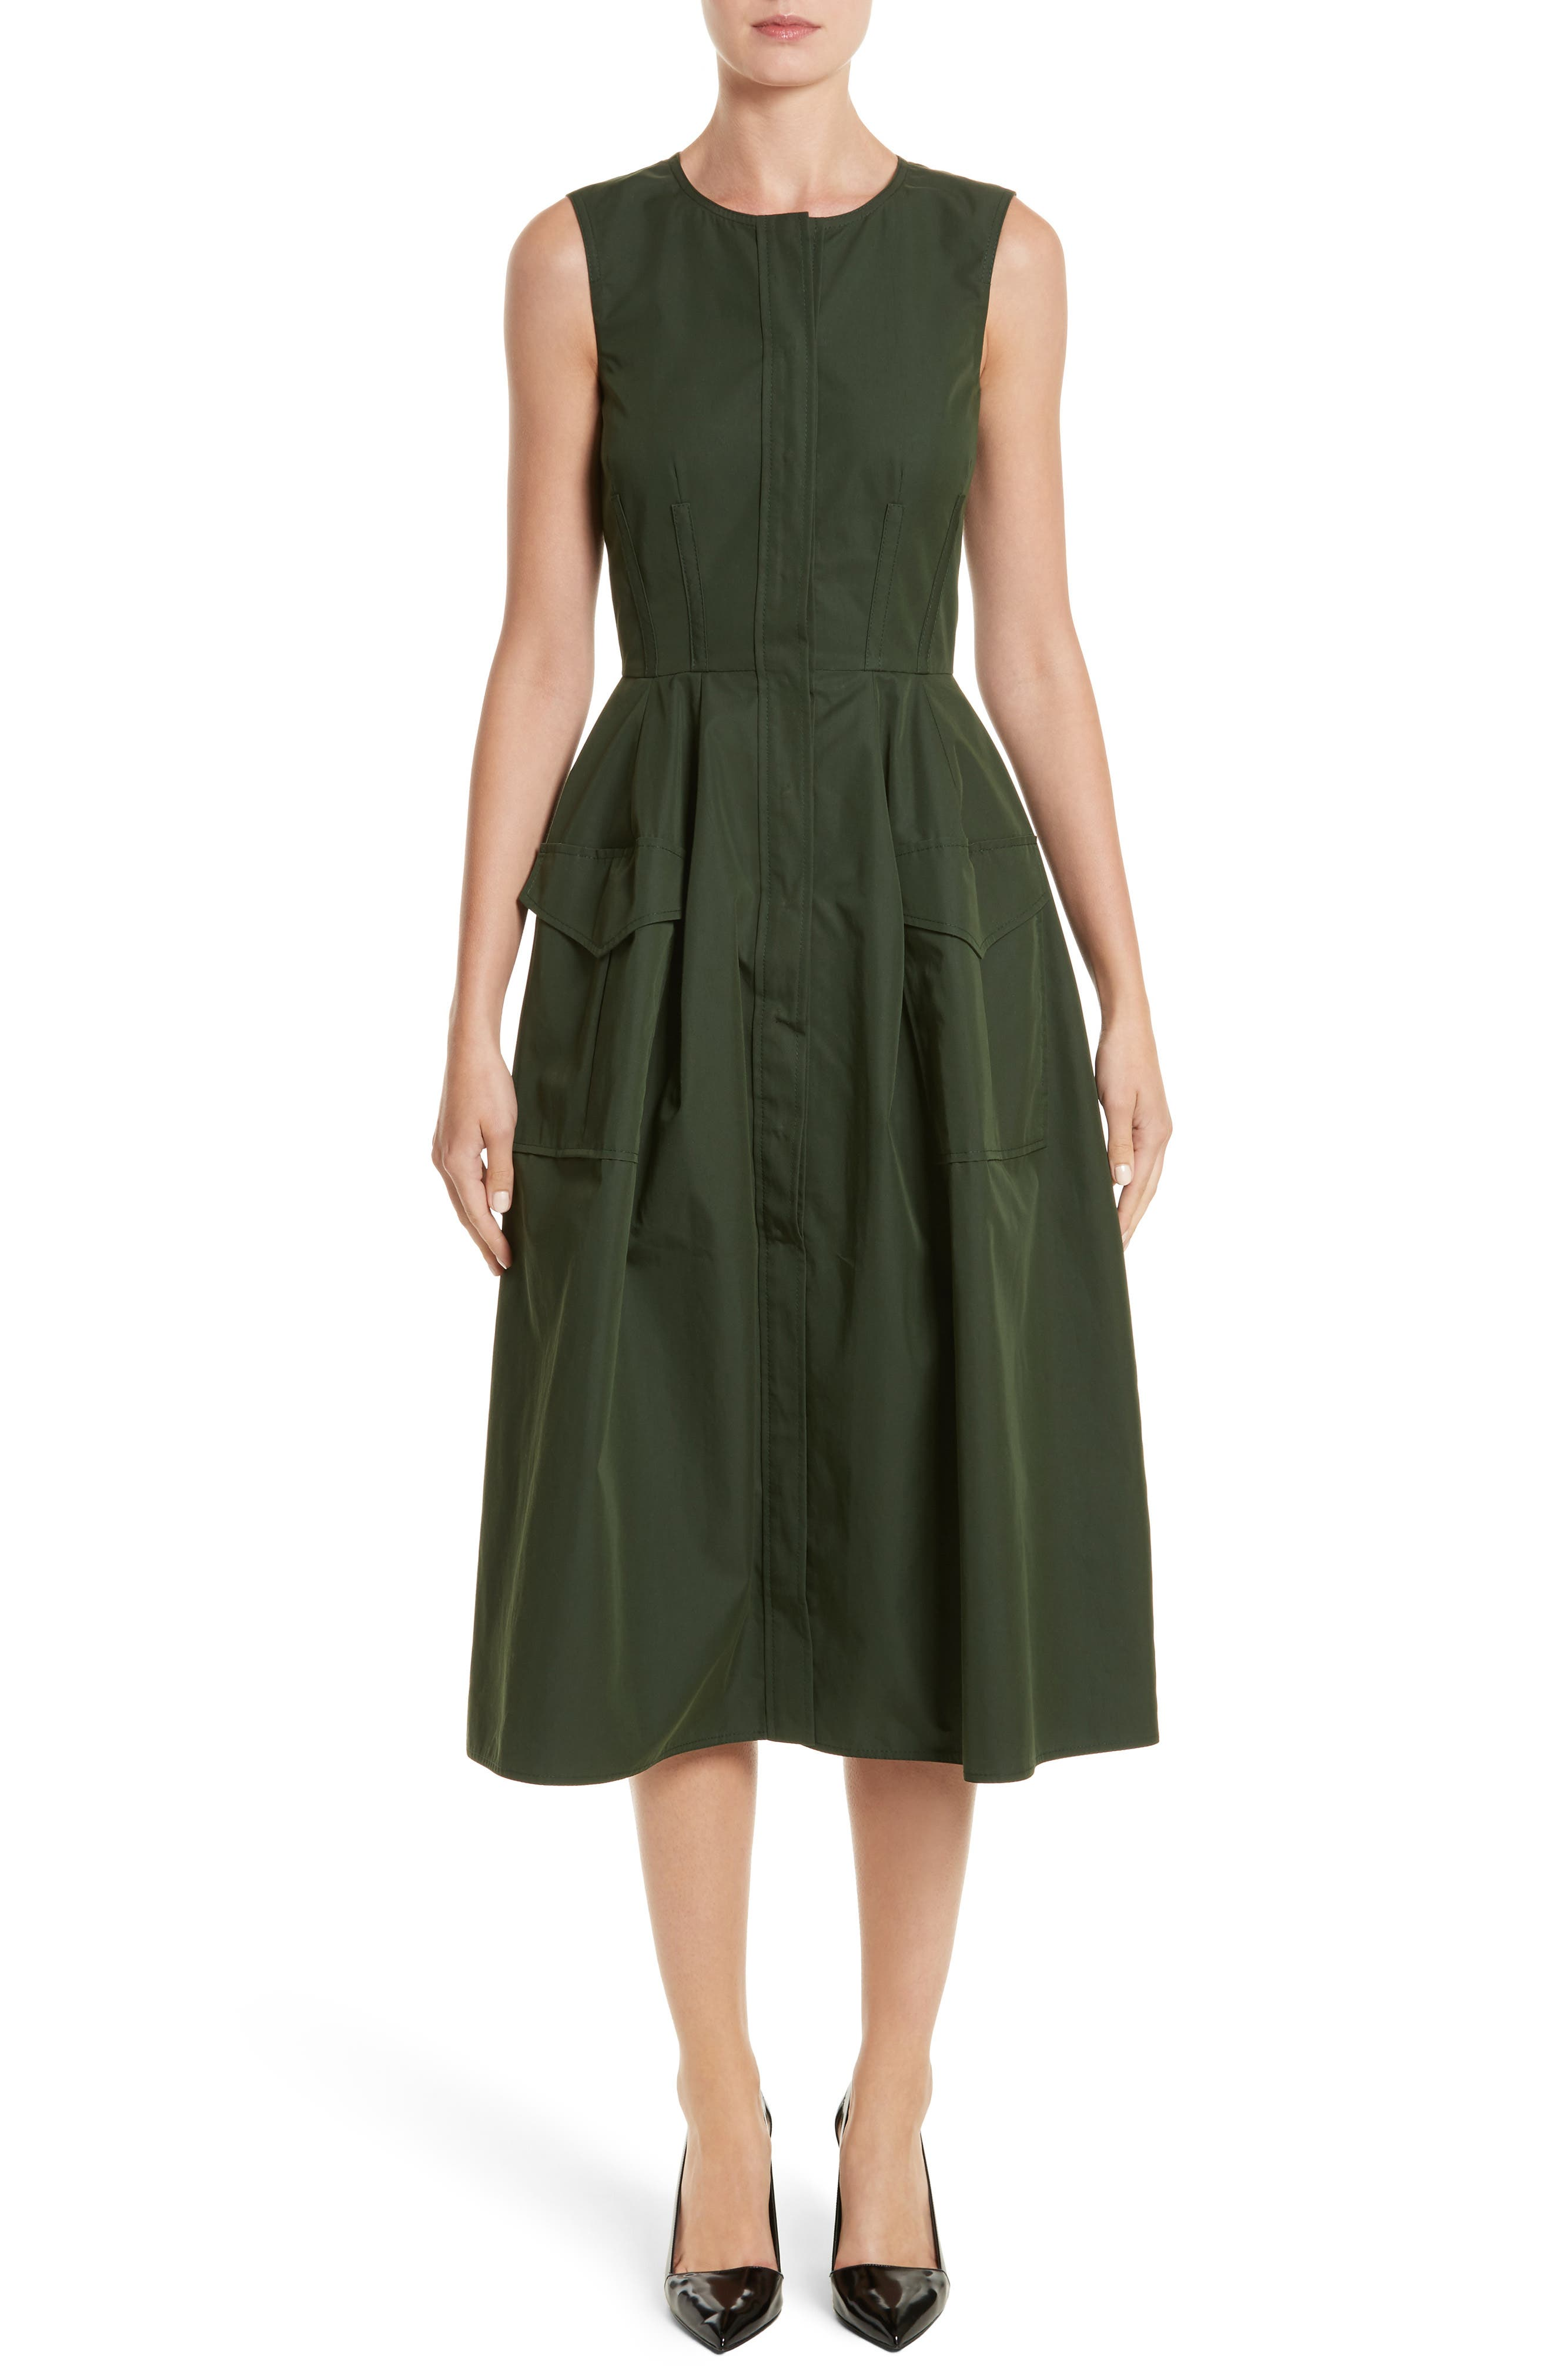 Alternate Image 1 Selected - Oscar de la Renta Safari Micro Twill Dress